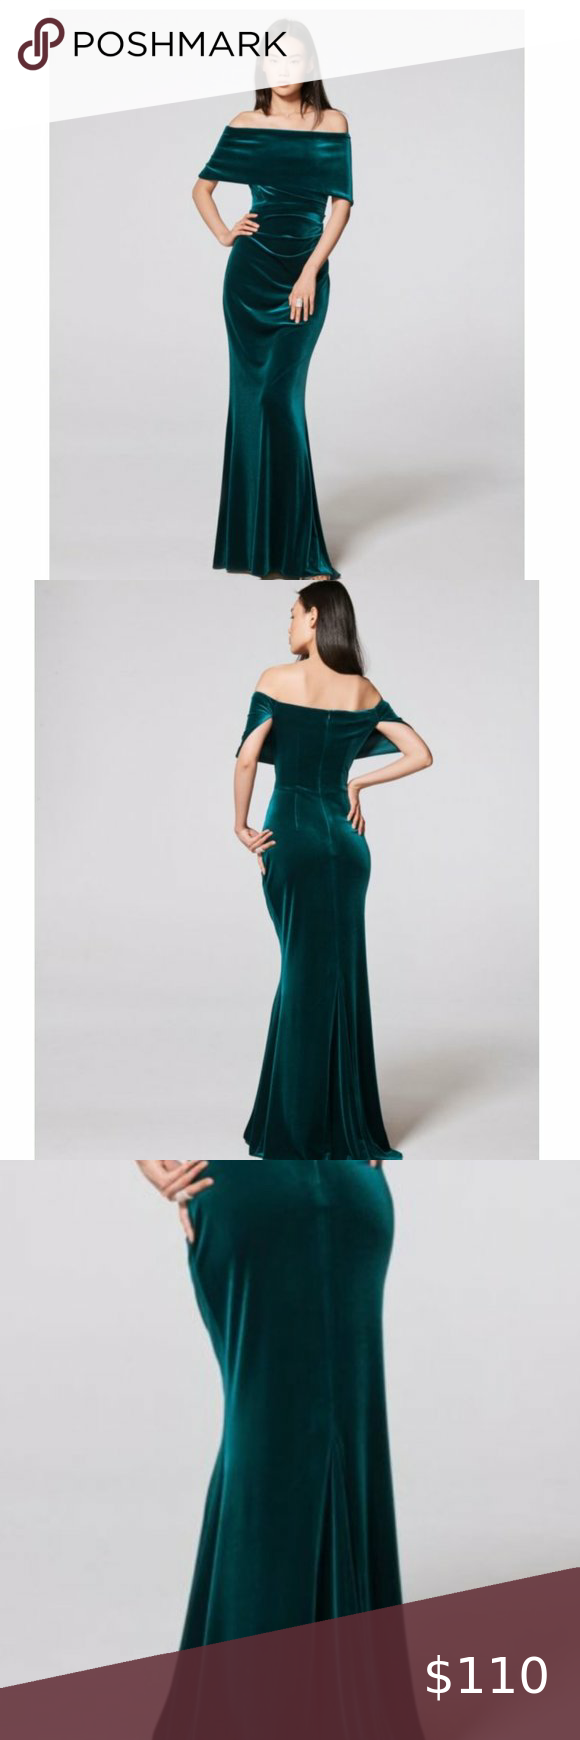 Vince Camuto Green Off The Shoulder Velvet Gown 10 Velvet Gown Gowns Womens Dresses [ 1740 x 580 Pixel ]